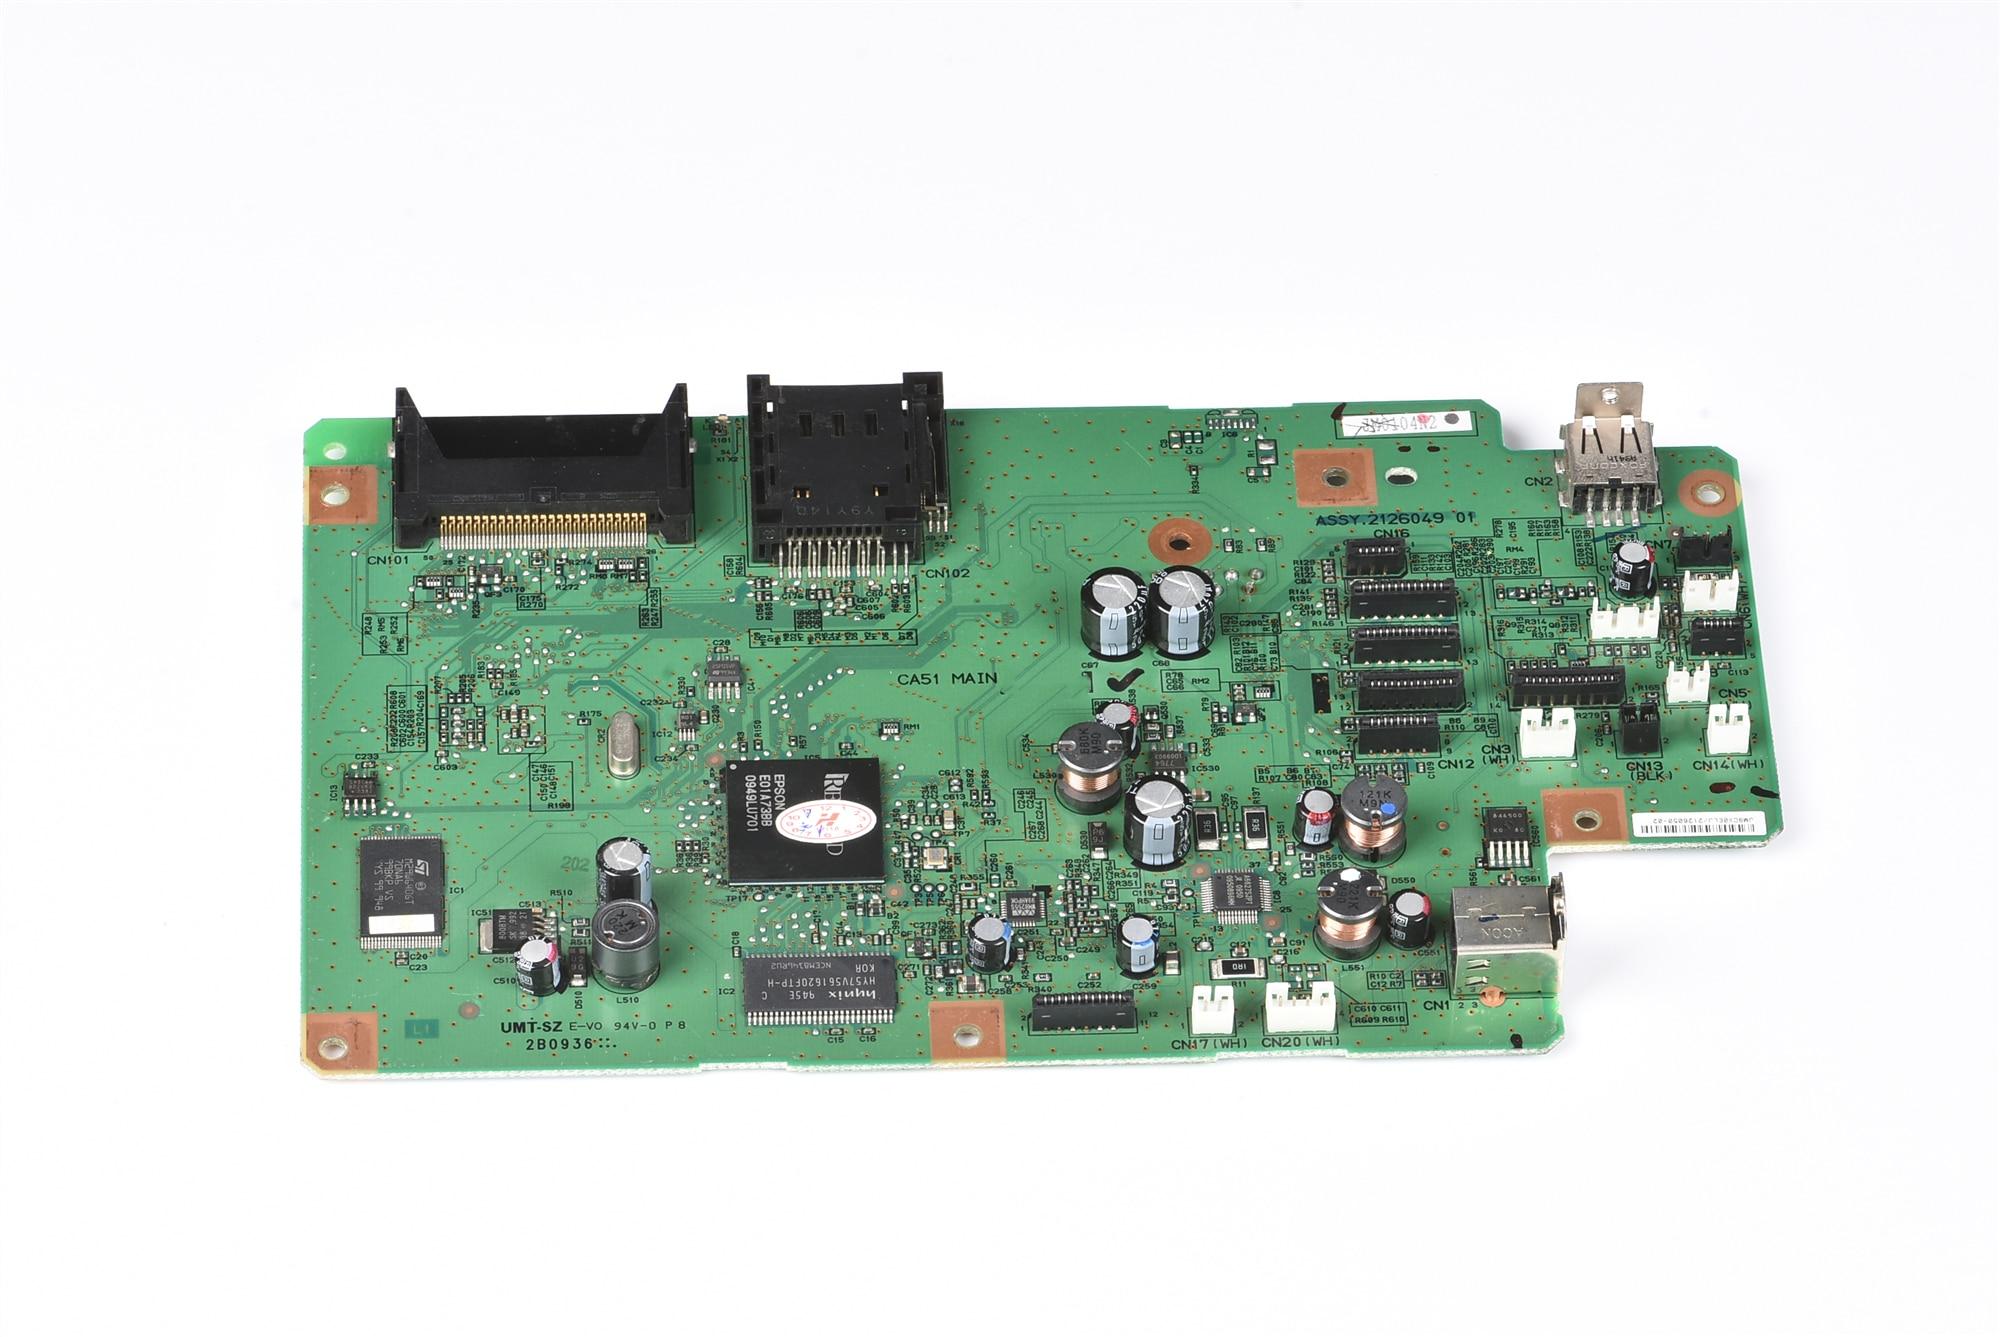 Placa madre formateadora logic Tablero Principal para impresora Epson TX650 PX650 EP-702A